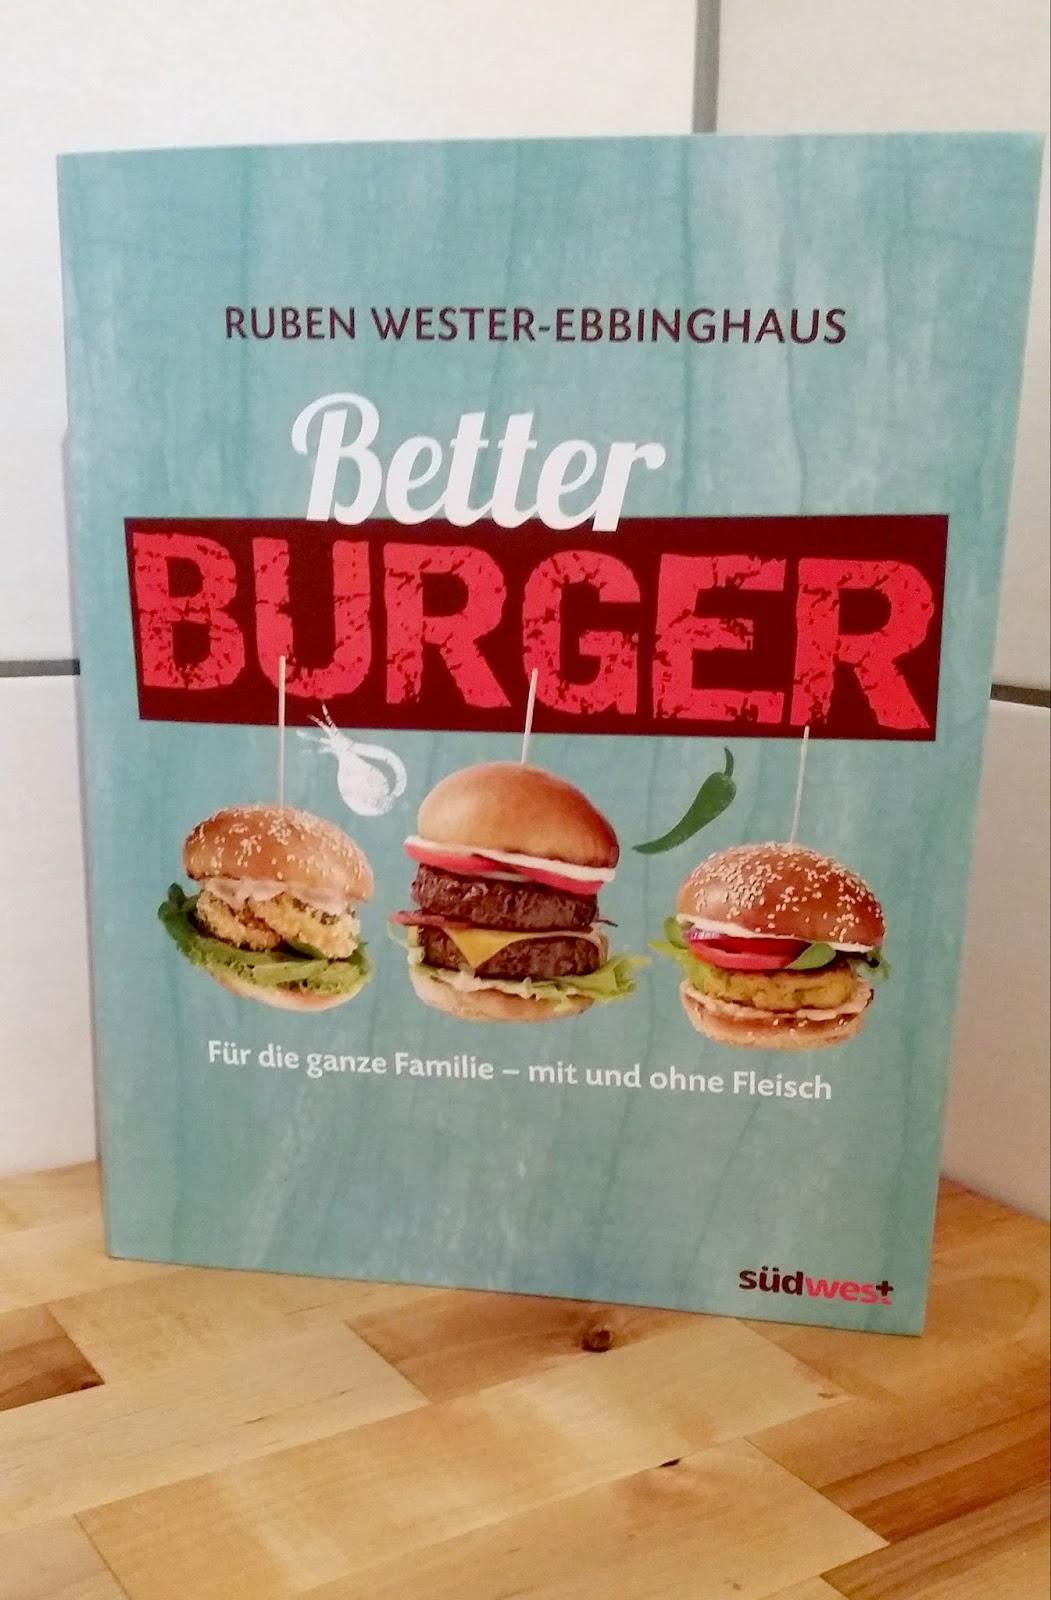 Ruben Wester-Ebbinghaus